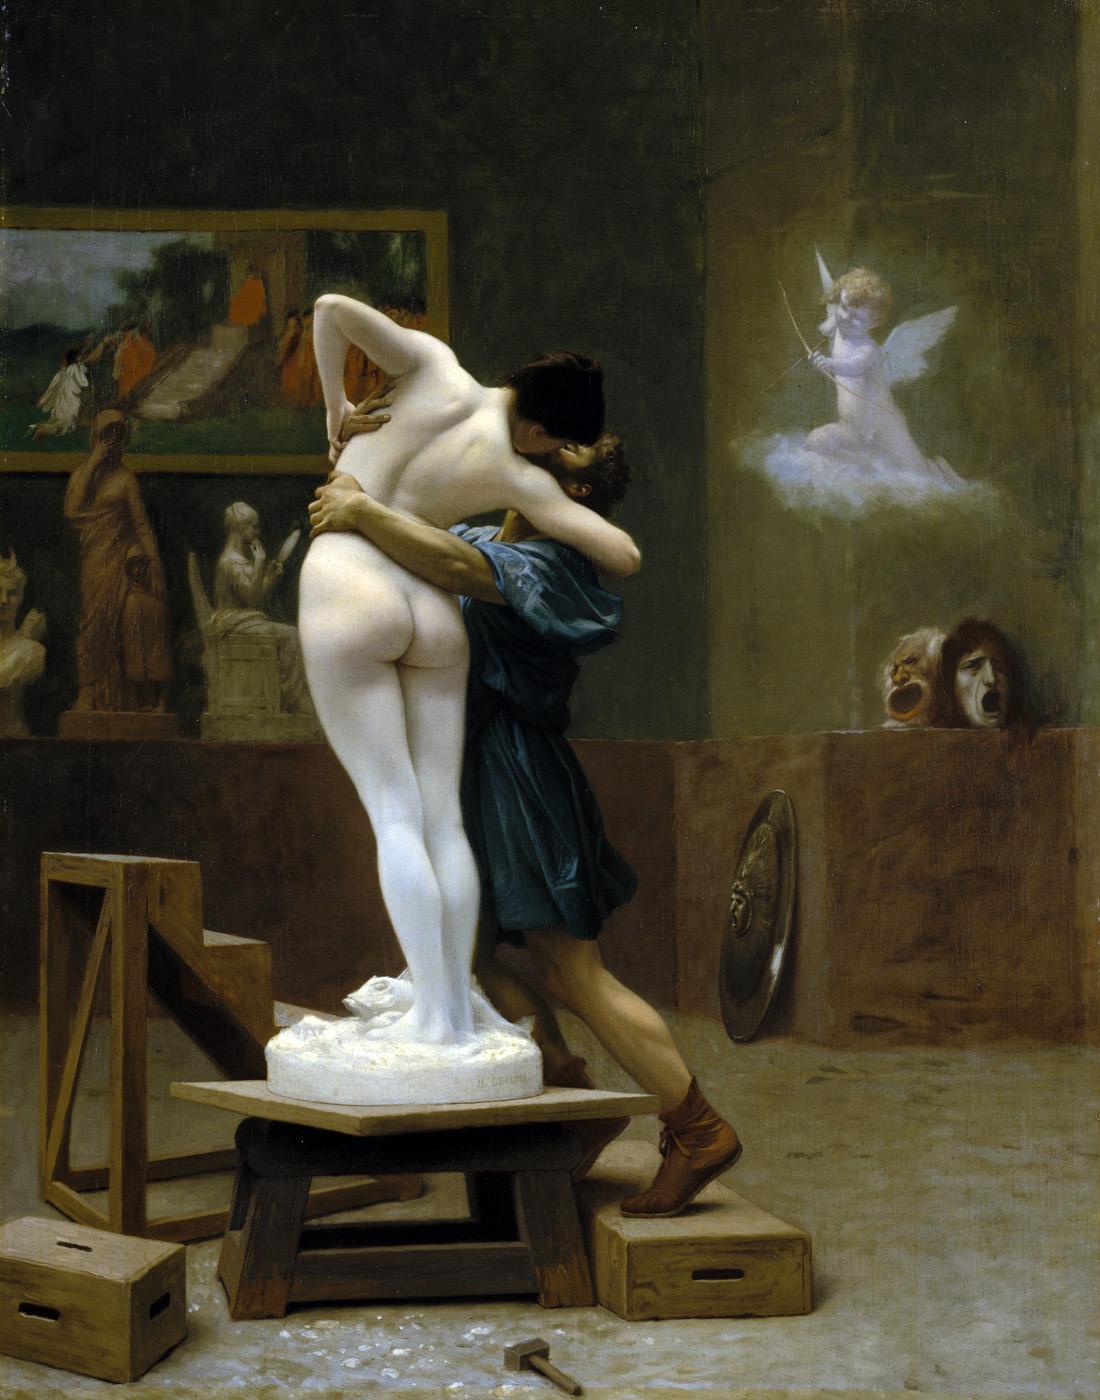 Pygmalion and Galatea, by Jean-Léon Gérôme, c. 1890. The Metropolitan Museum of Art, Gift of Louis C. Raegner, 1927. (